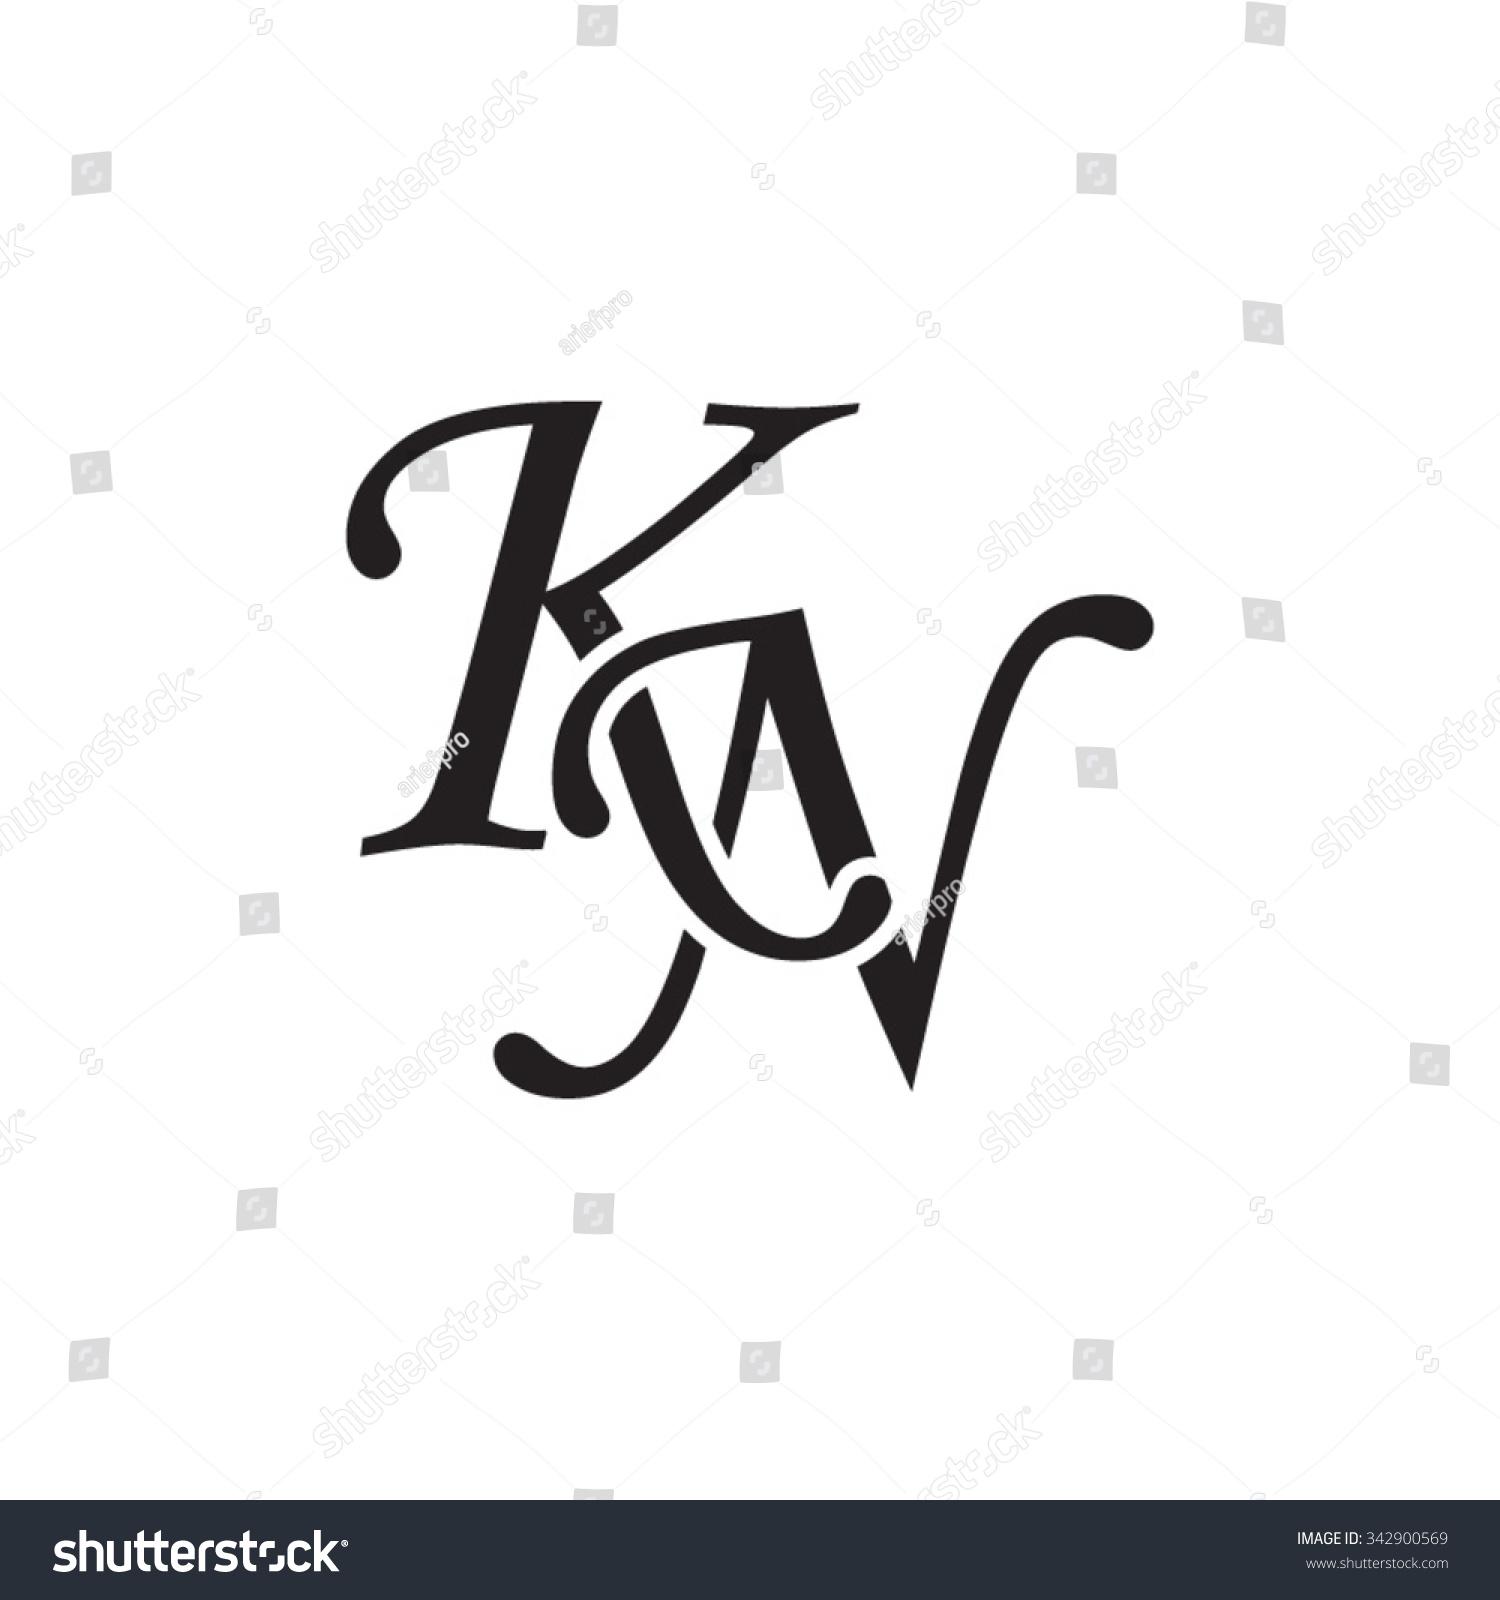 Royalty-free KN initial monogram logo #342900569 Stock ...